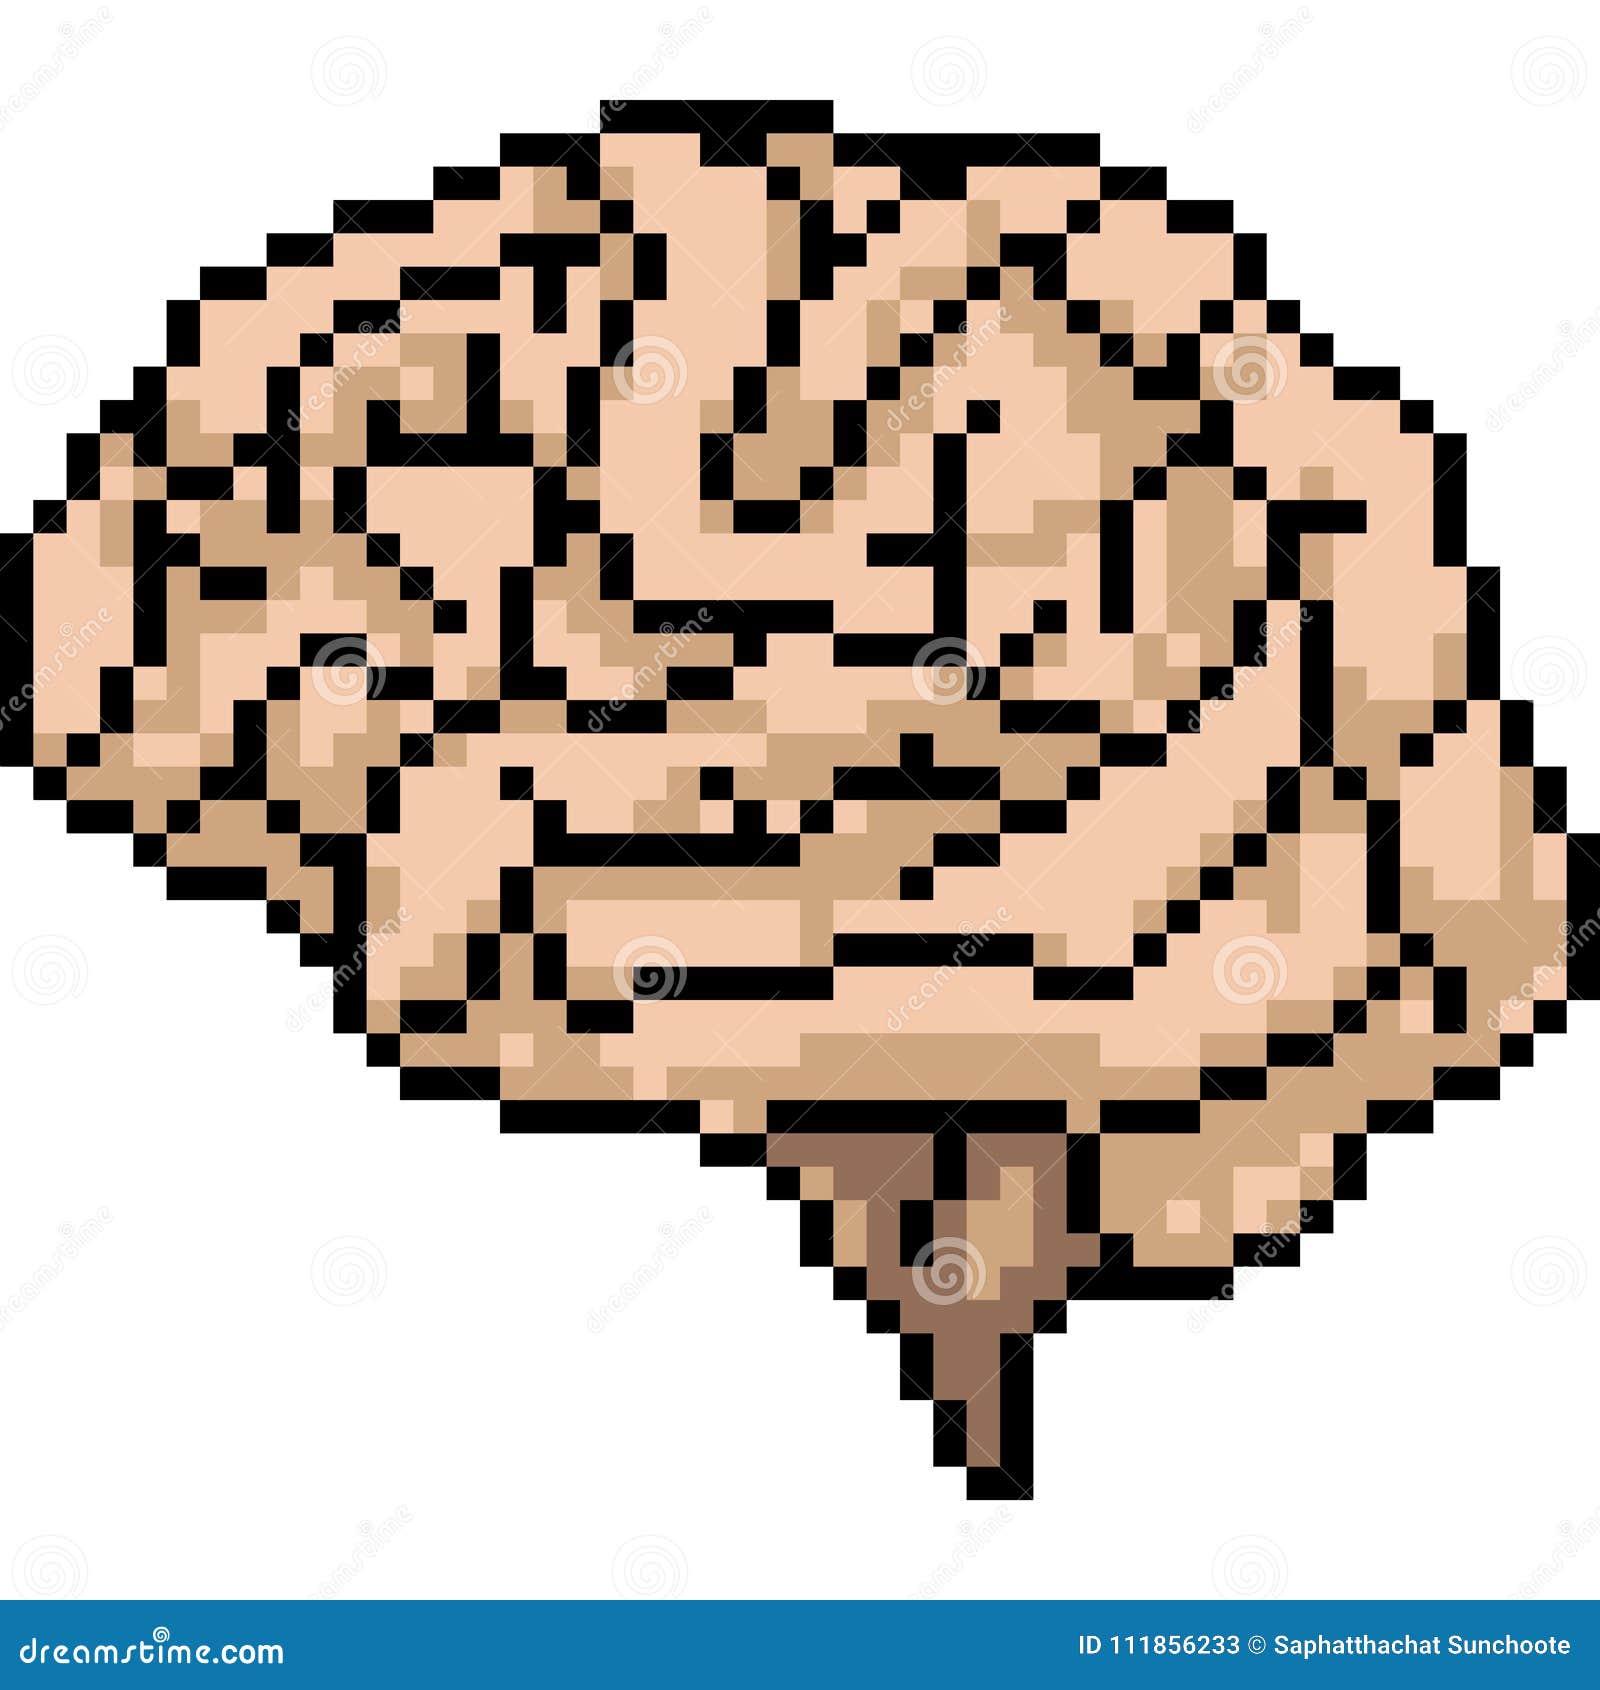 Superior Download Vector Pixel Art Brain Stock Vector. Illustration Of Brain    111856233